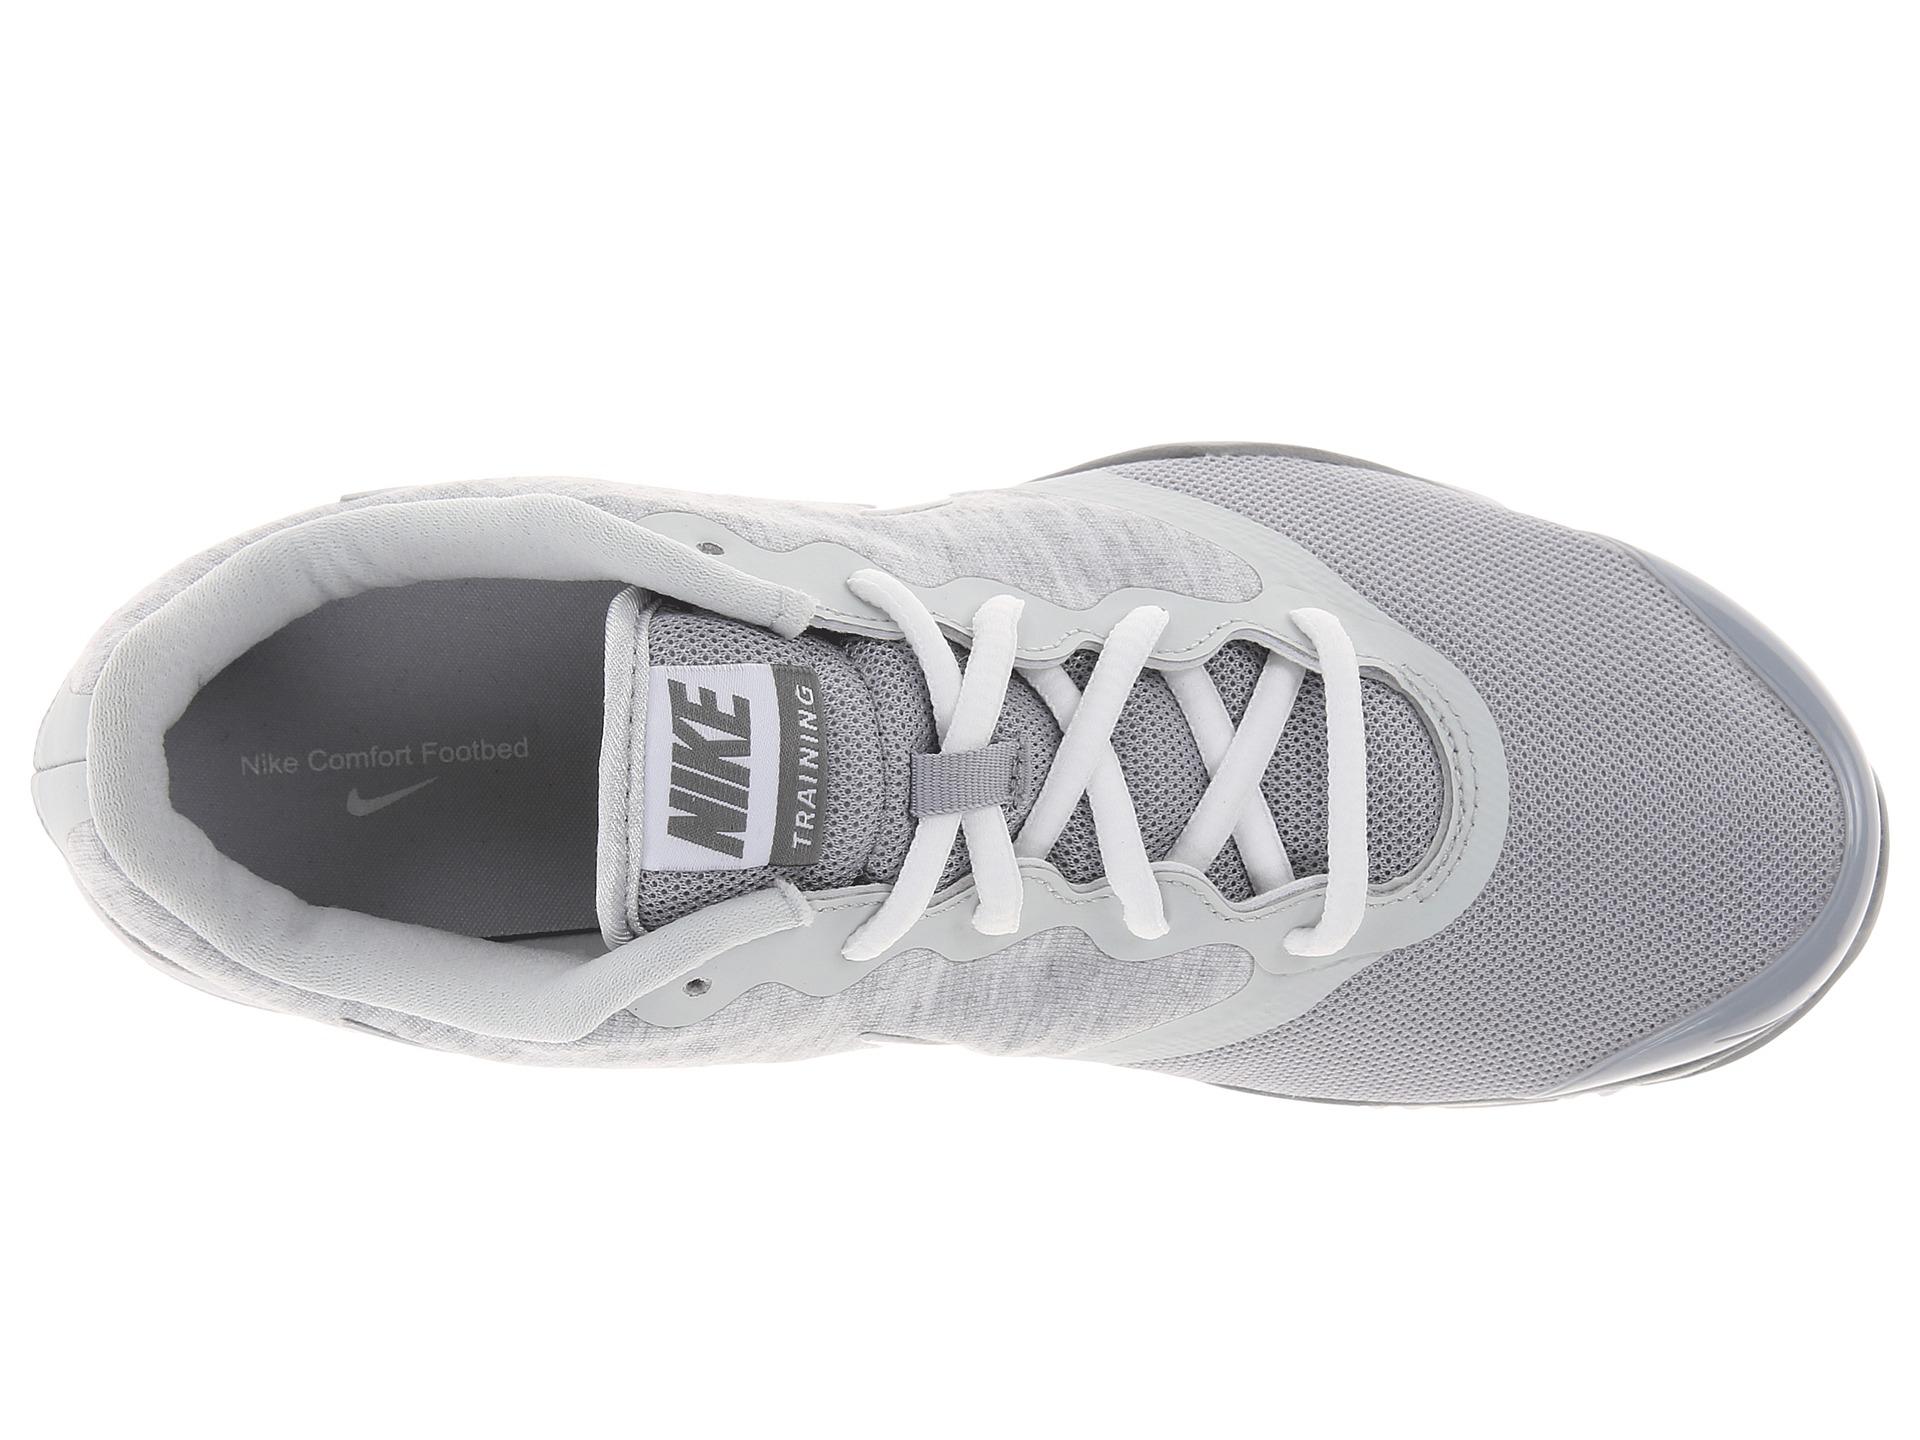 on sandals s greyhyper footbed thong p plus comforter grey wolf comfort punch women greywolf nike slip ultra